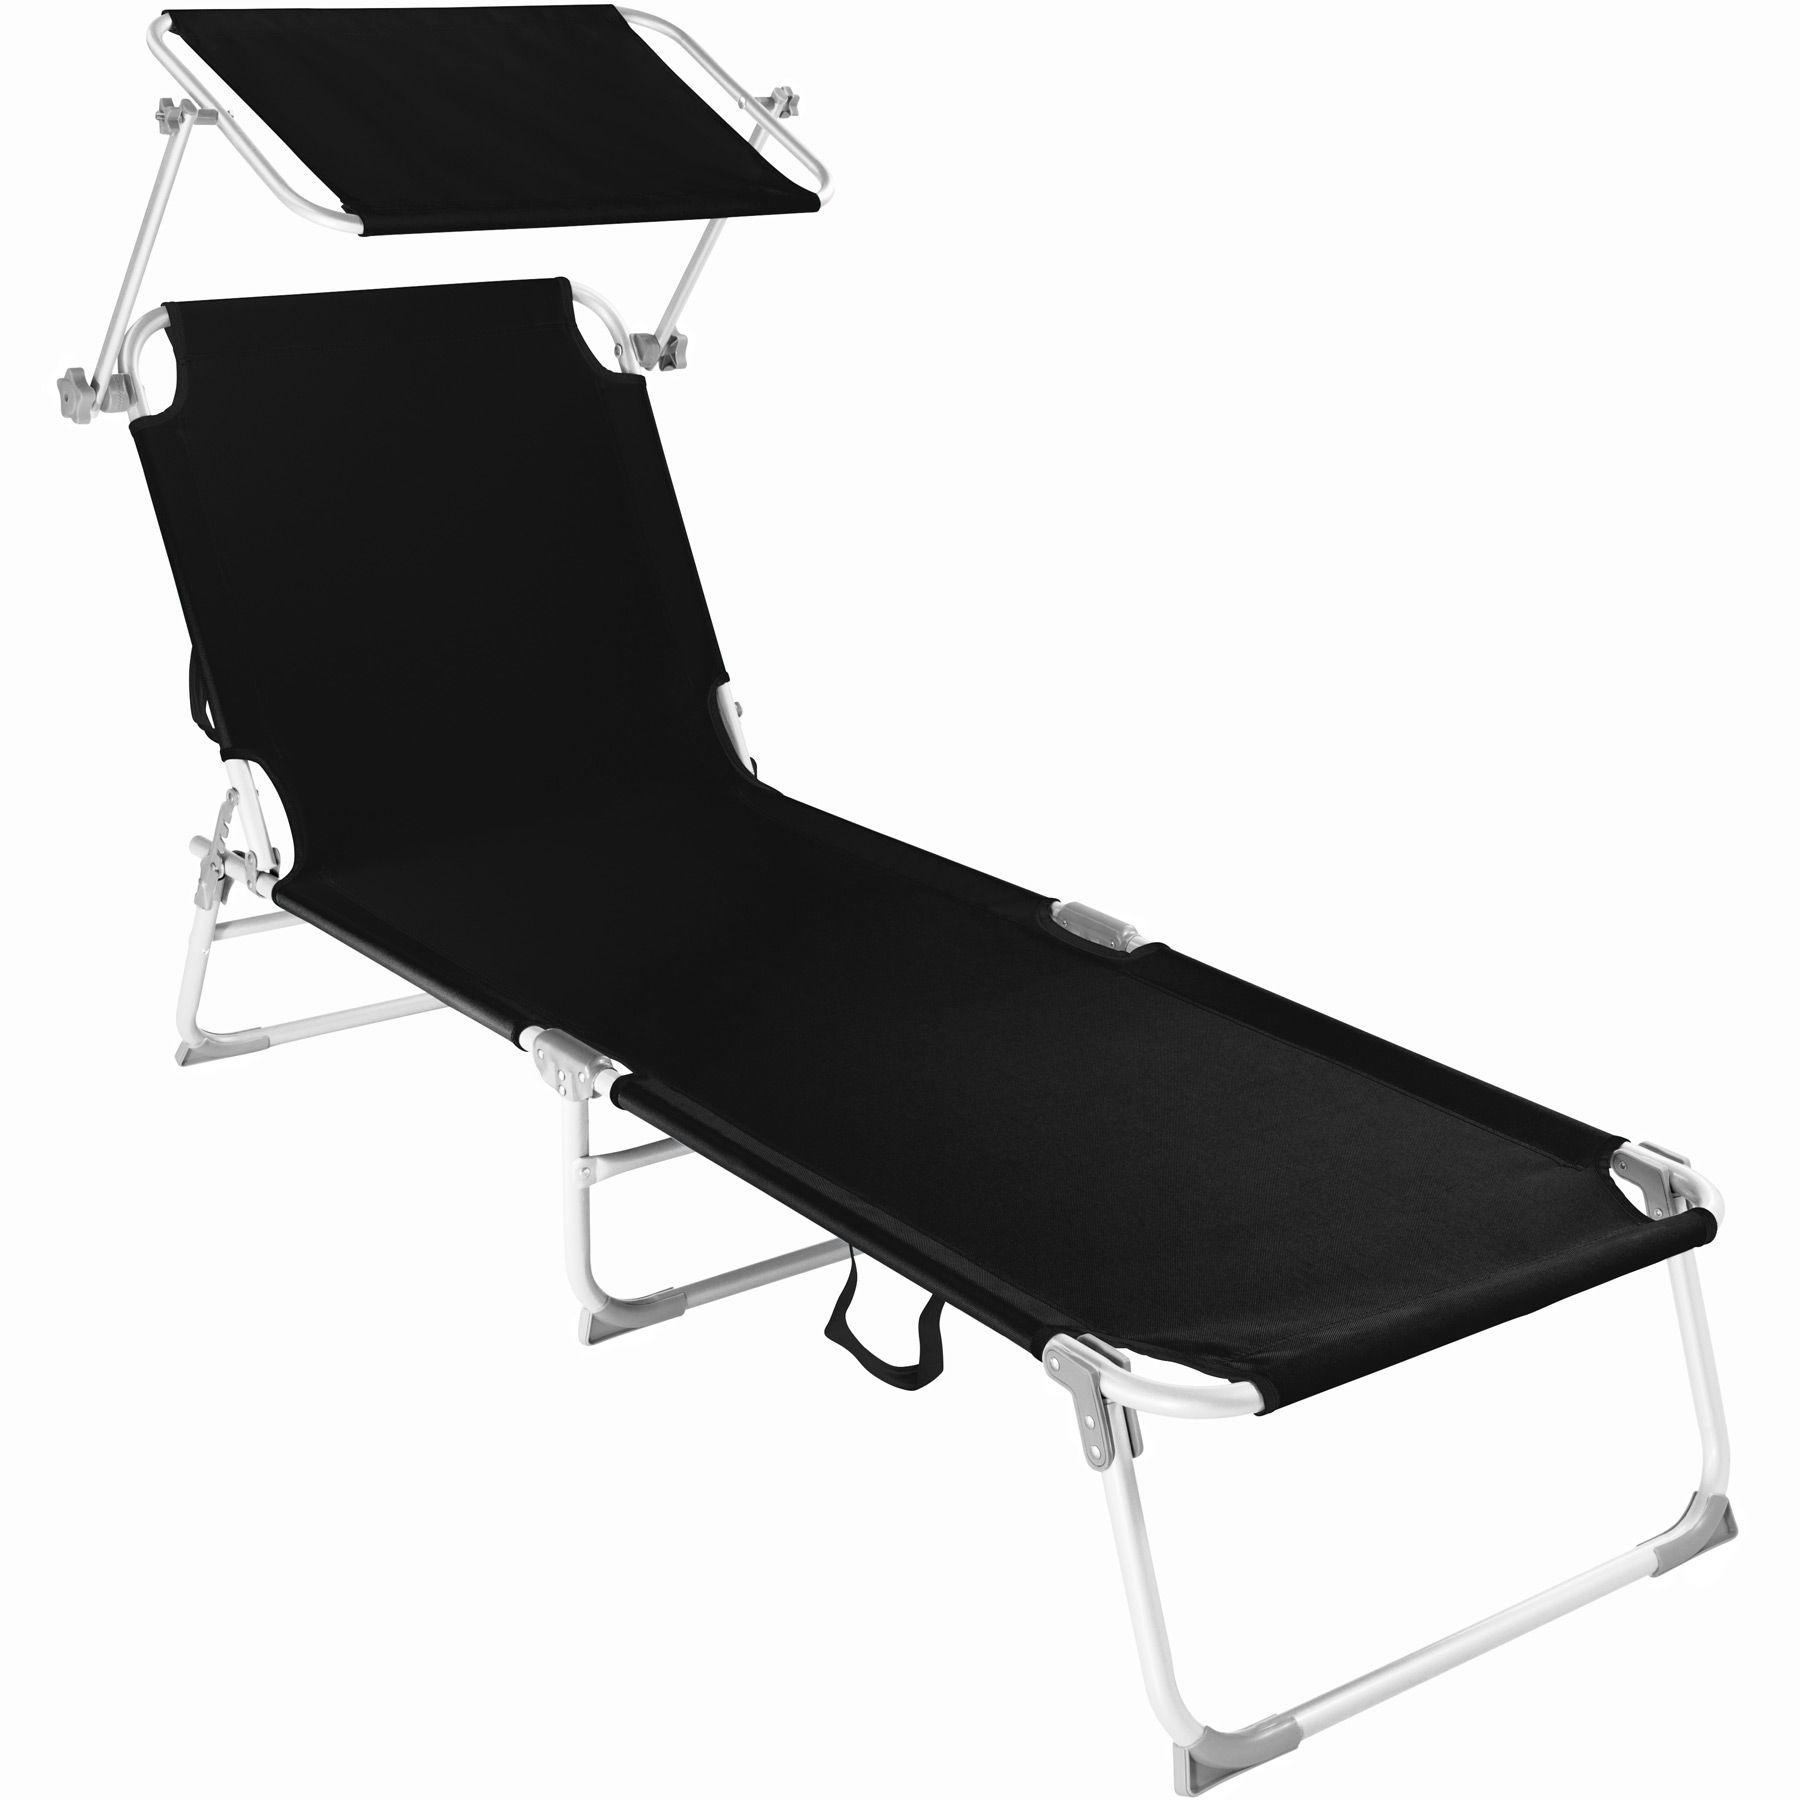 alu chaise longue de jardin pliante transat bain de soleil + pare